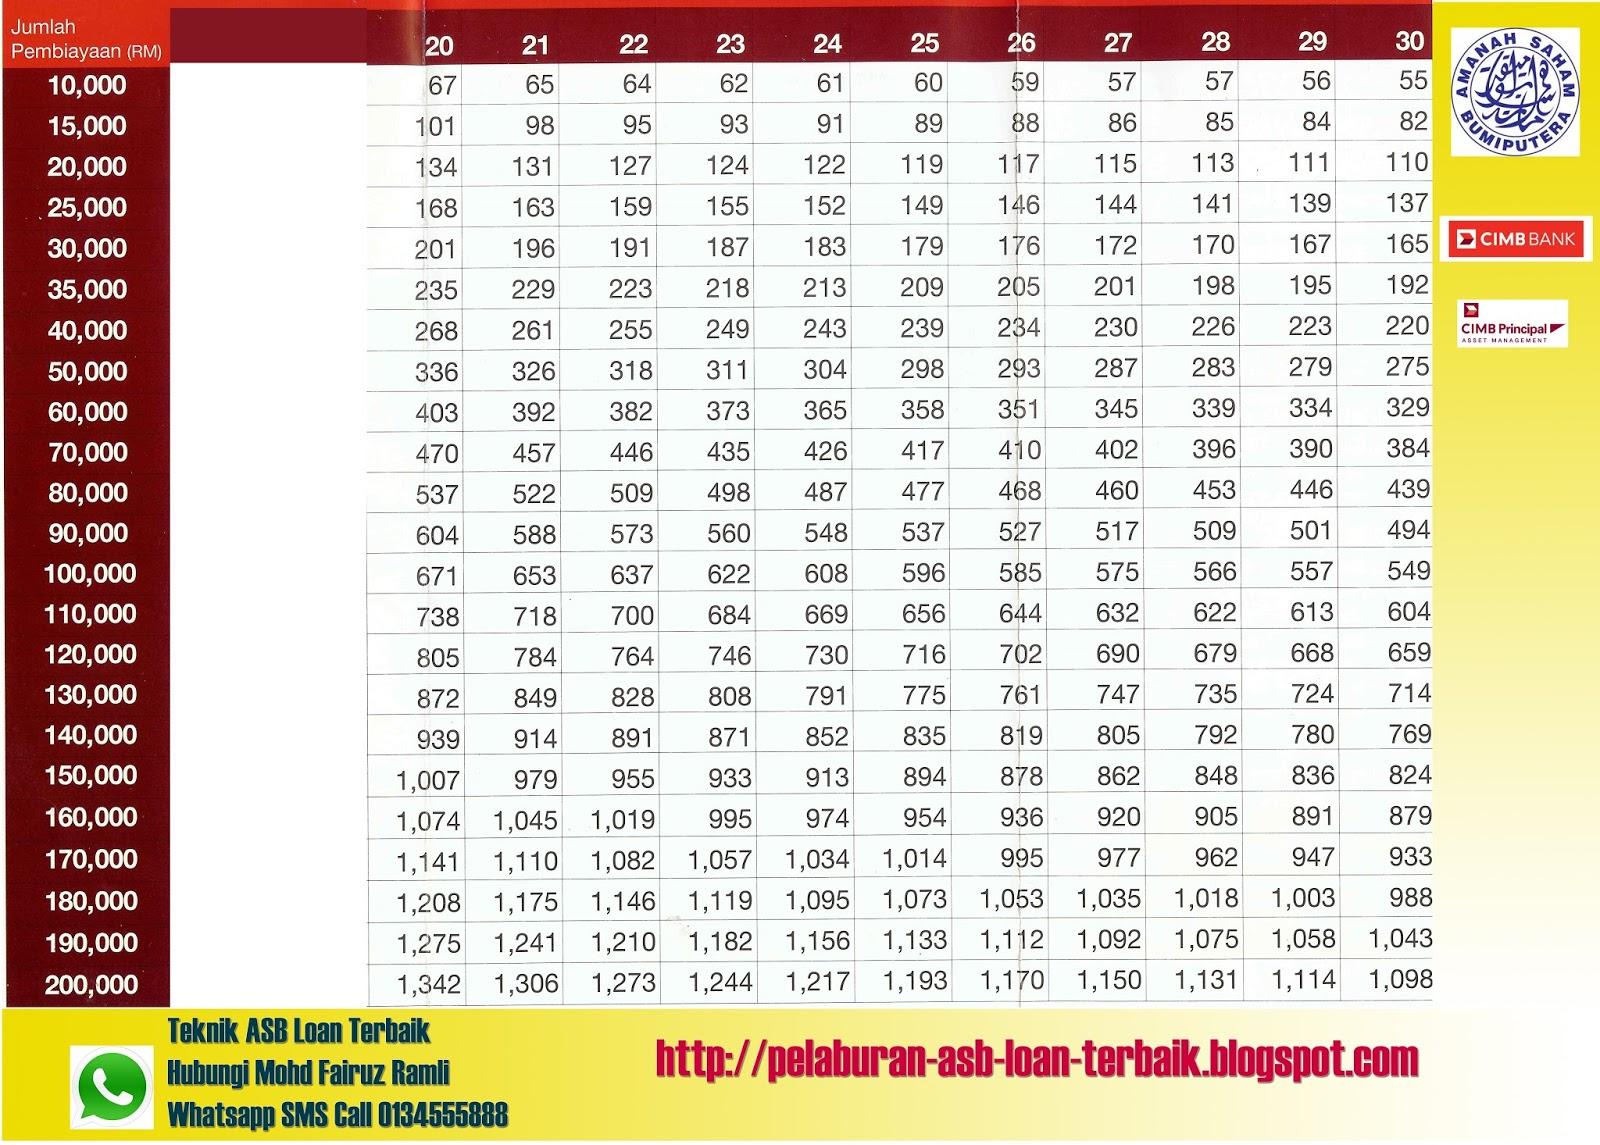 Asb Loan Schedule 2017 >> Table Loan Principlesofafreesociety